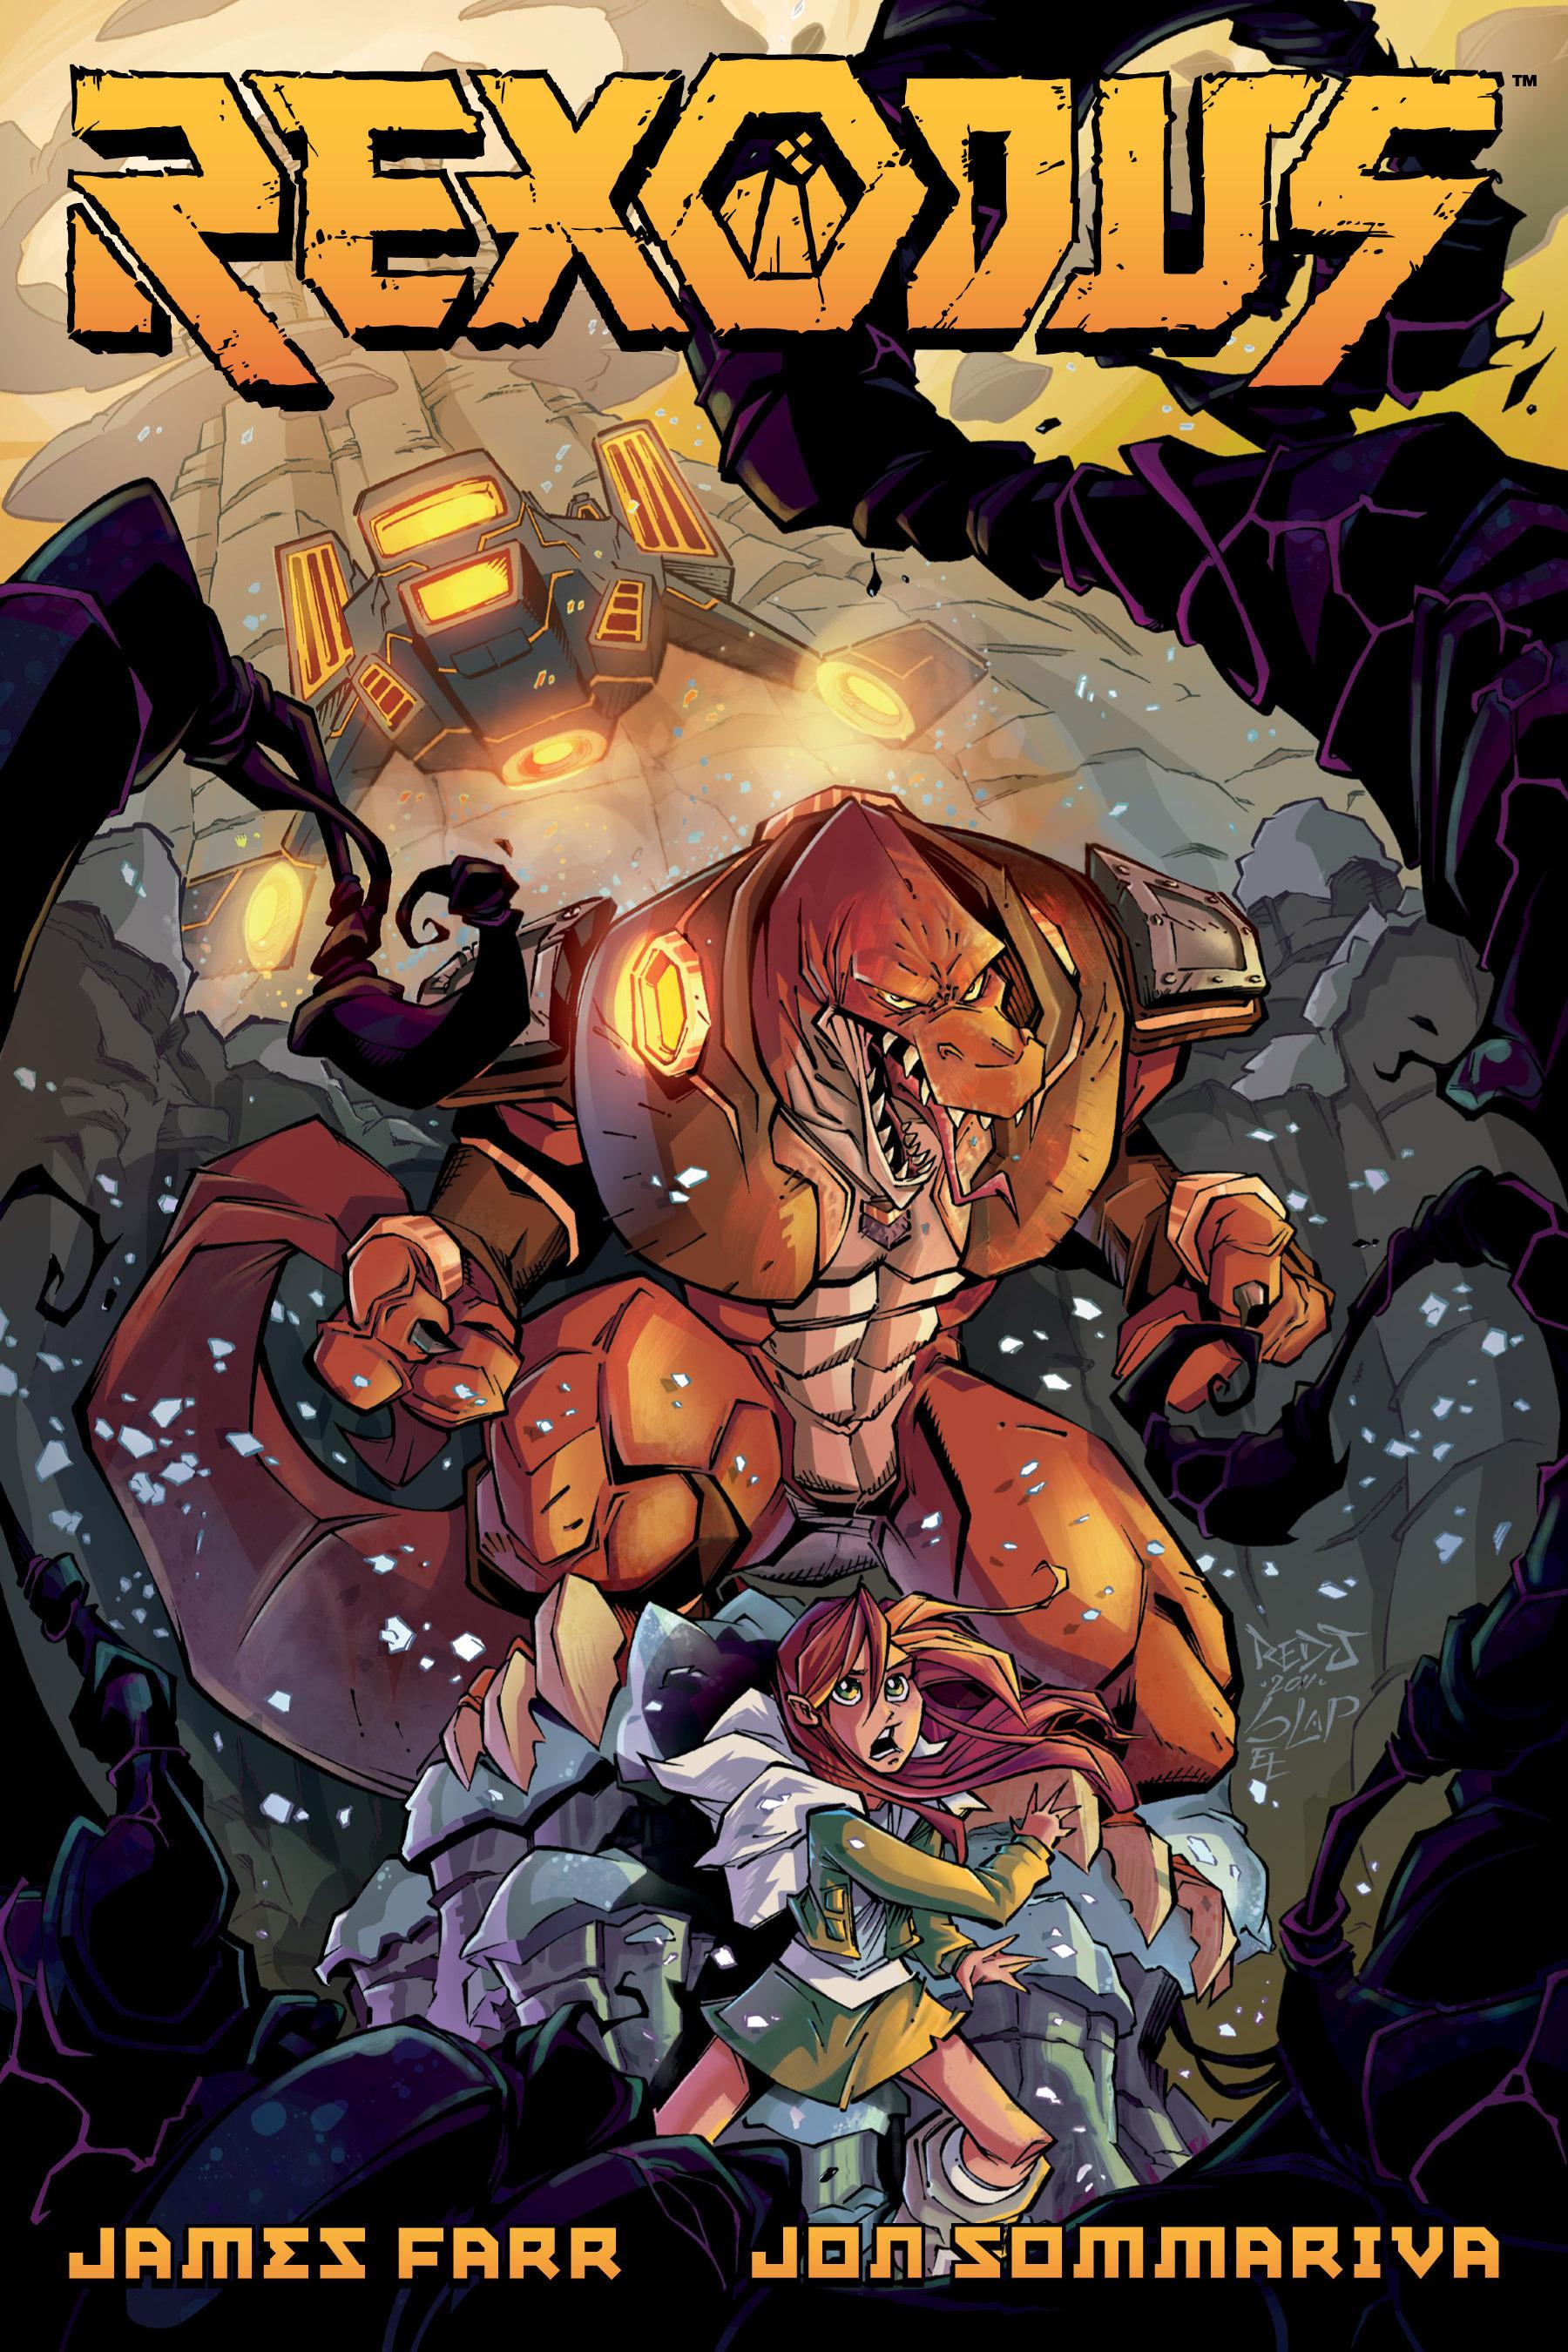 Read online Rexodus comic -  Issue # Full - 1